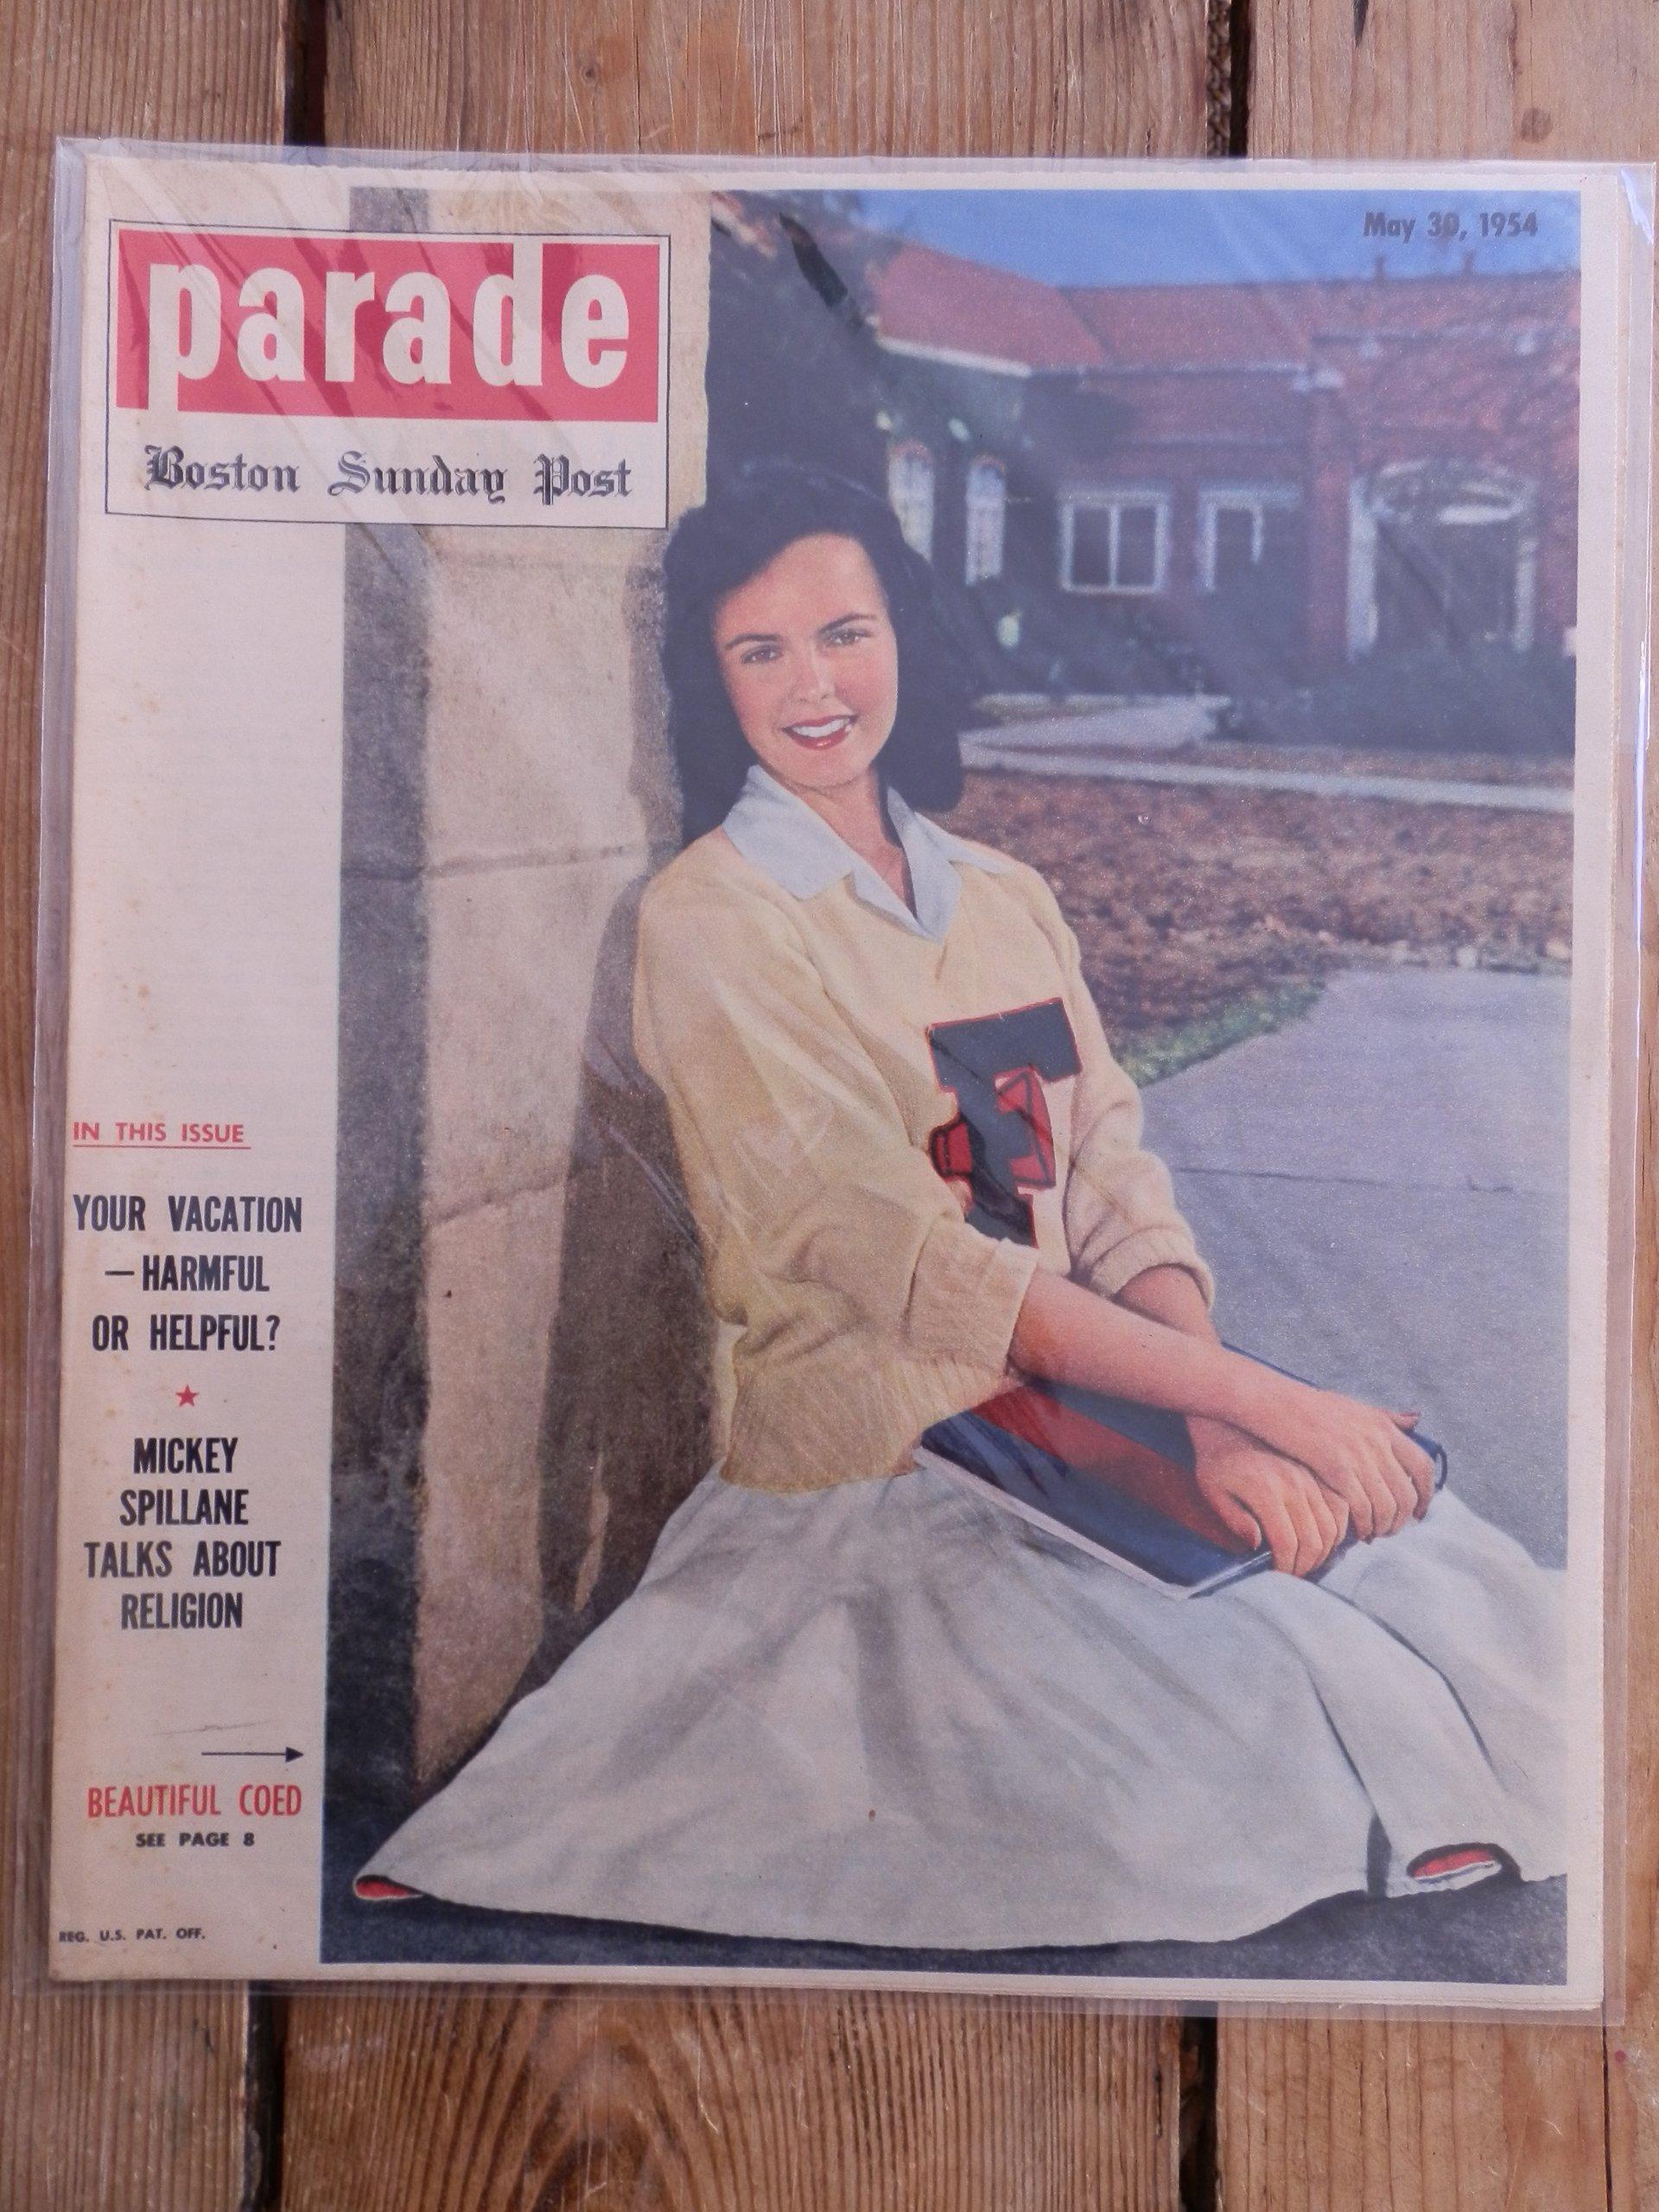 Parade Magazine - Boston Sunday Post May 30 1954: Jess